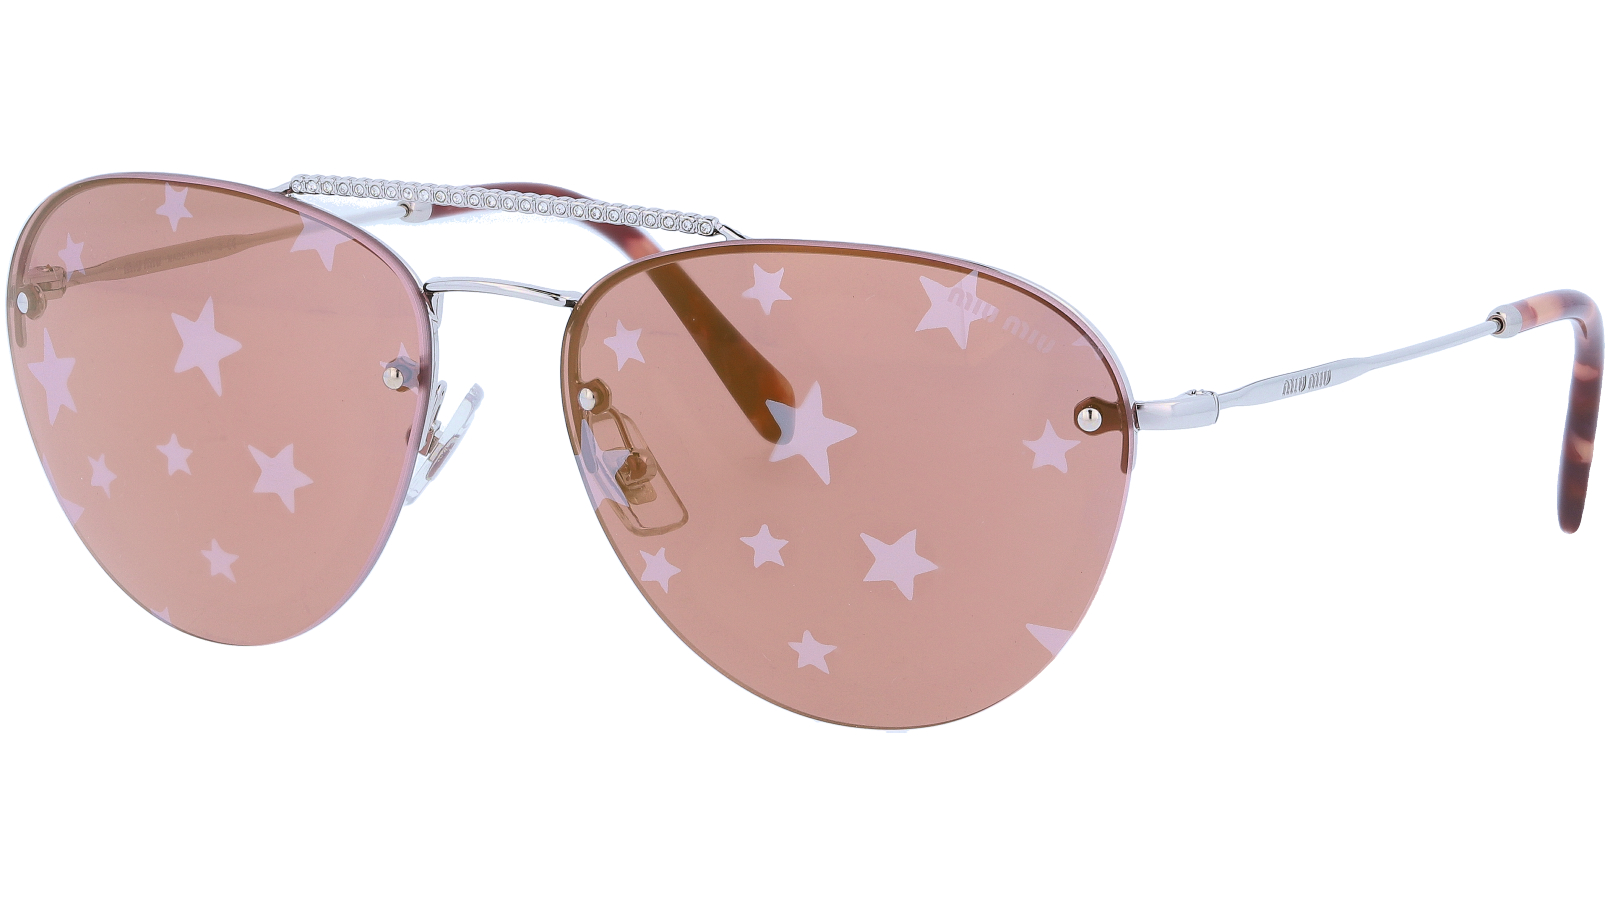 MIU MIU MU54US 1BC195 59 Silver Pink Sunglasses